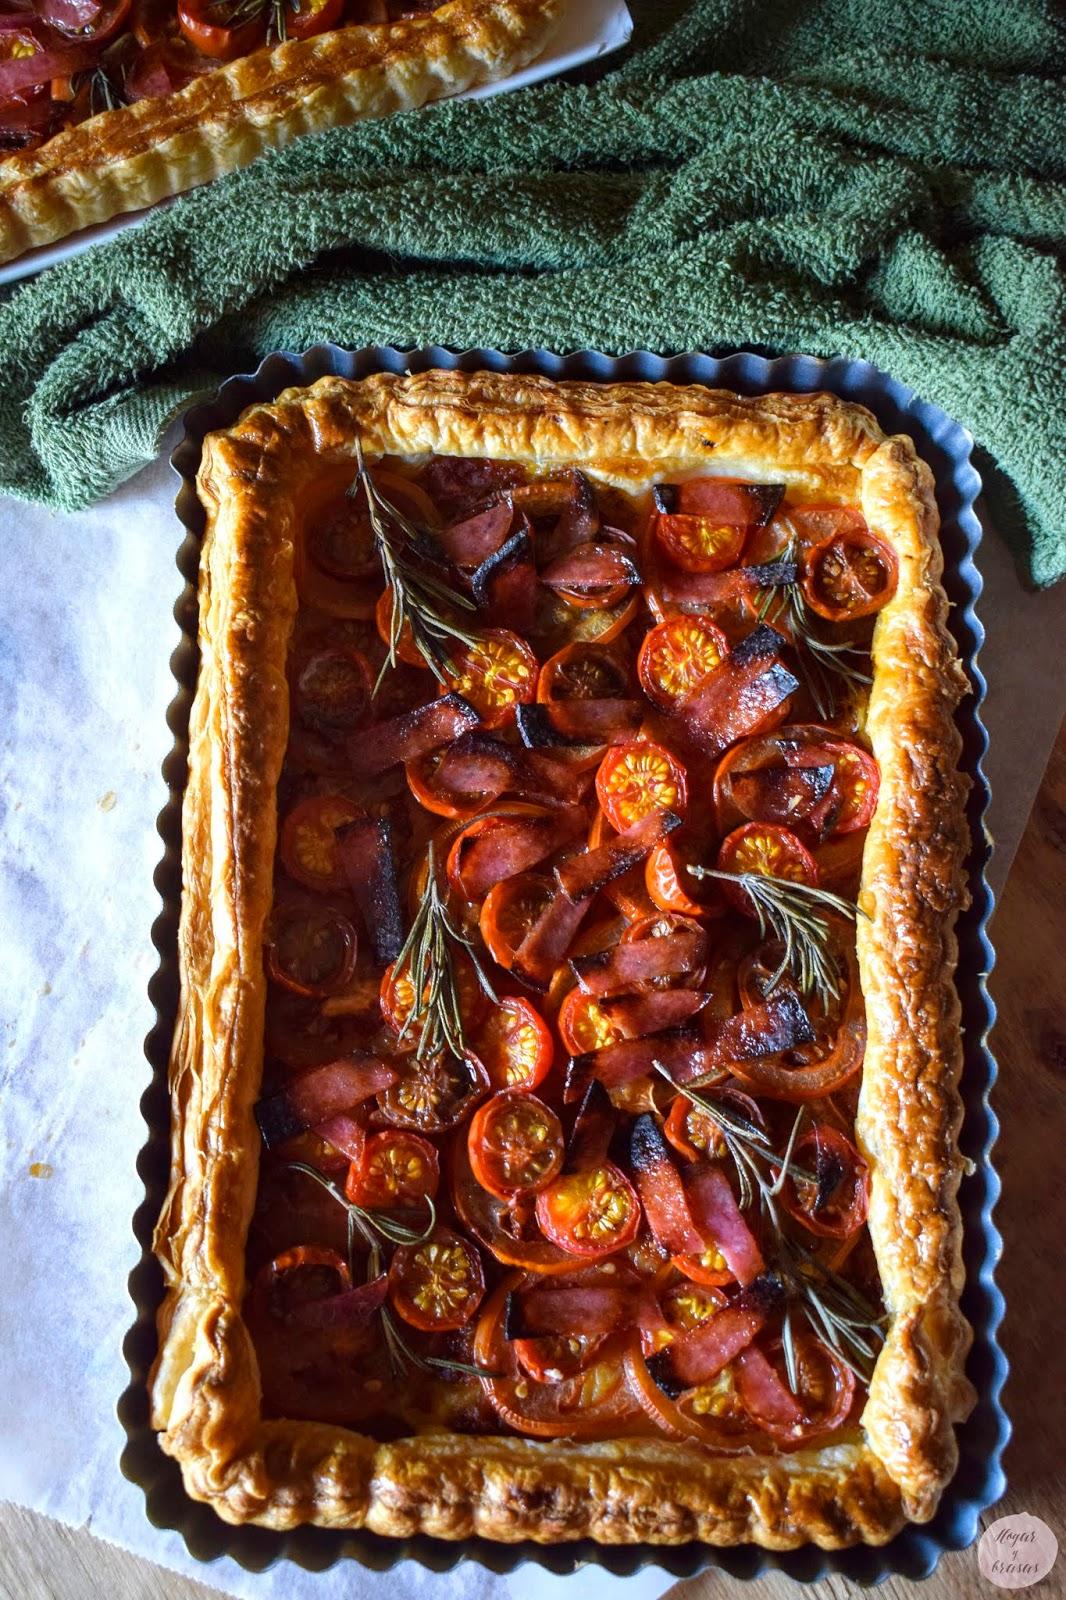 Tarta de hojaldre a los tres tomates